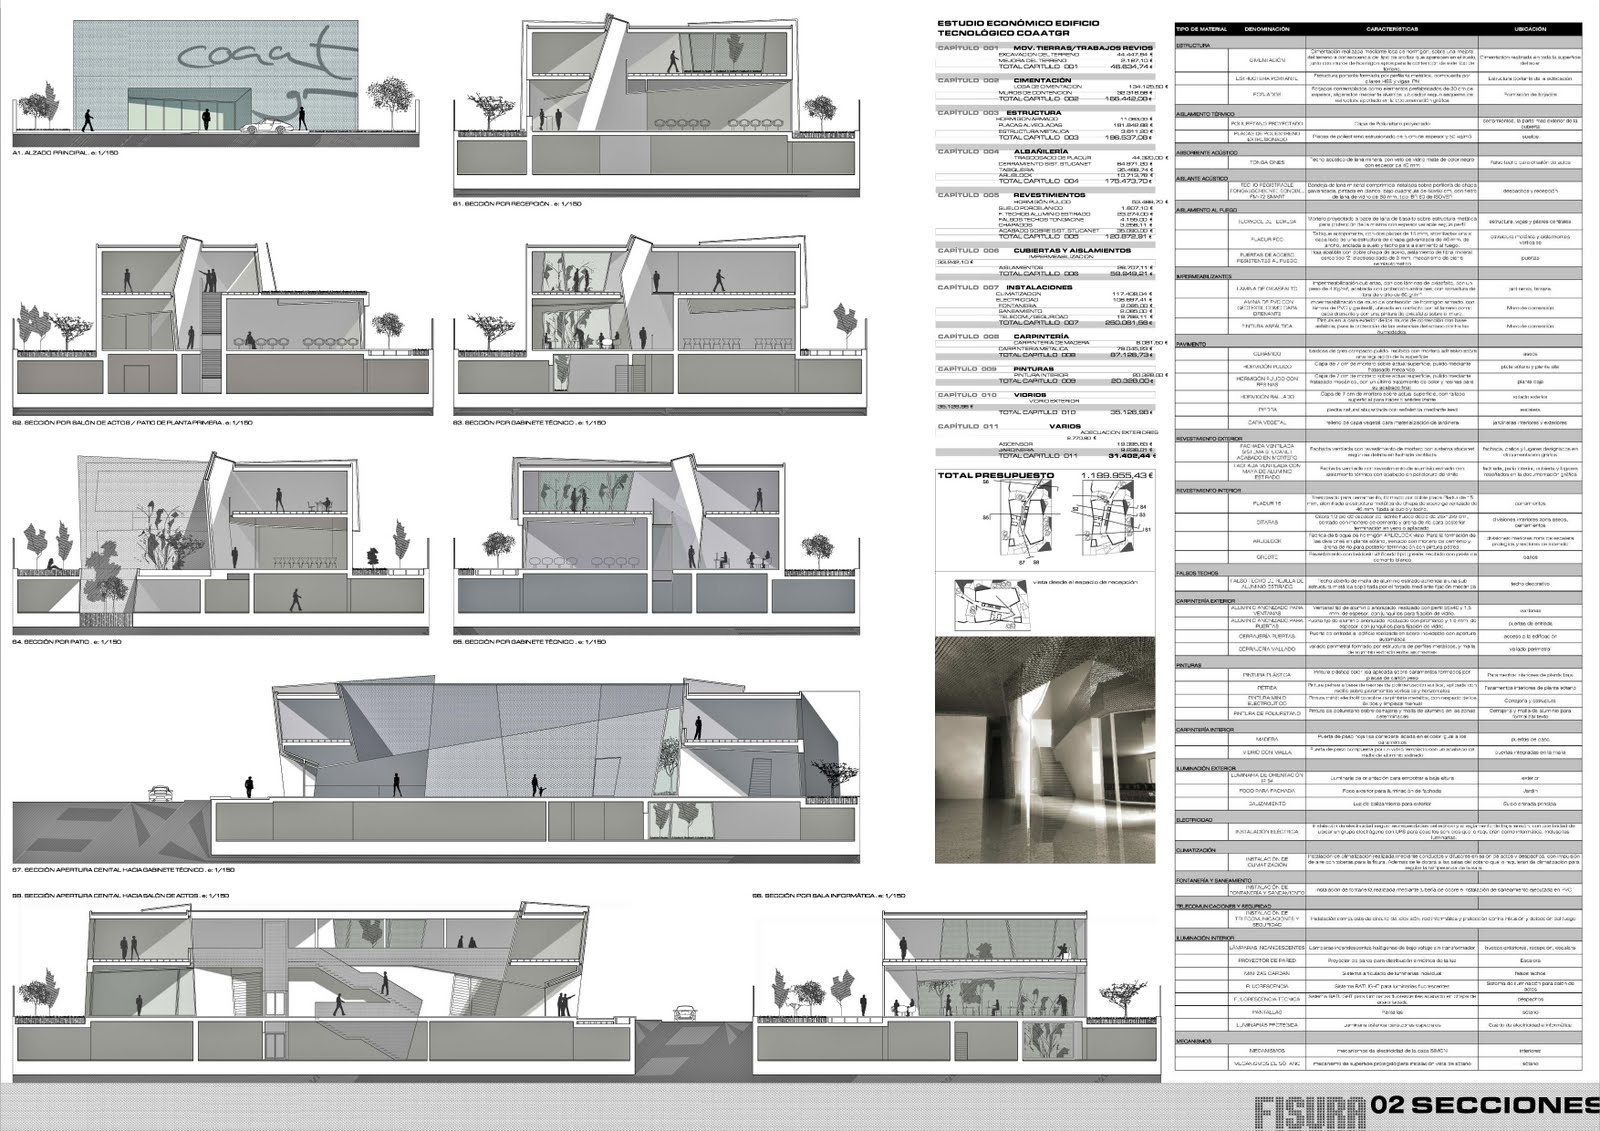 Arquitectura fronteriza 2008 concurso edificio - Arquitectos de granada ...